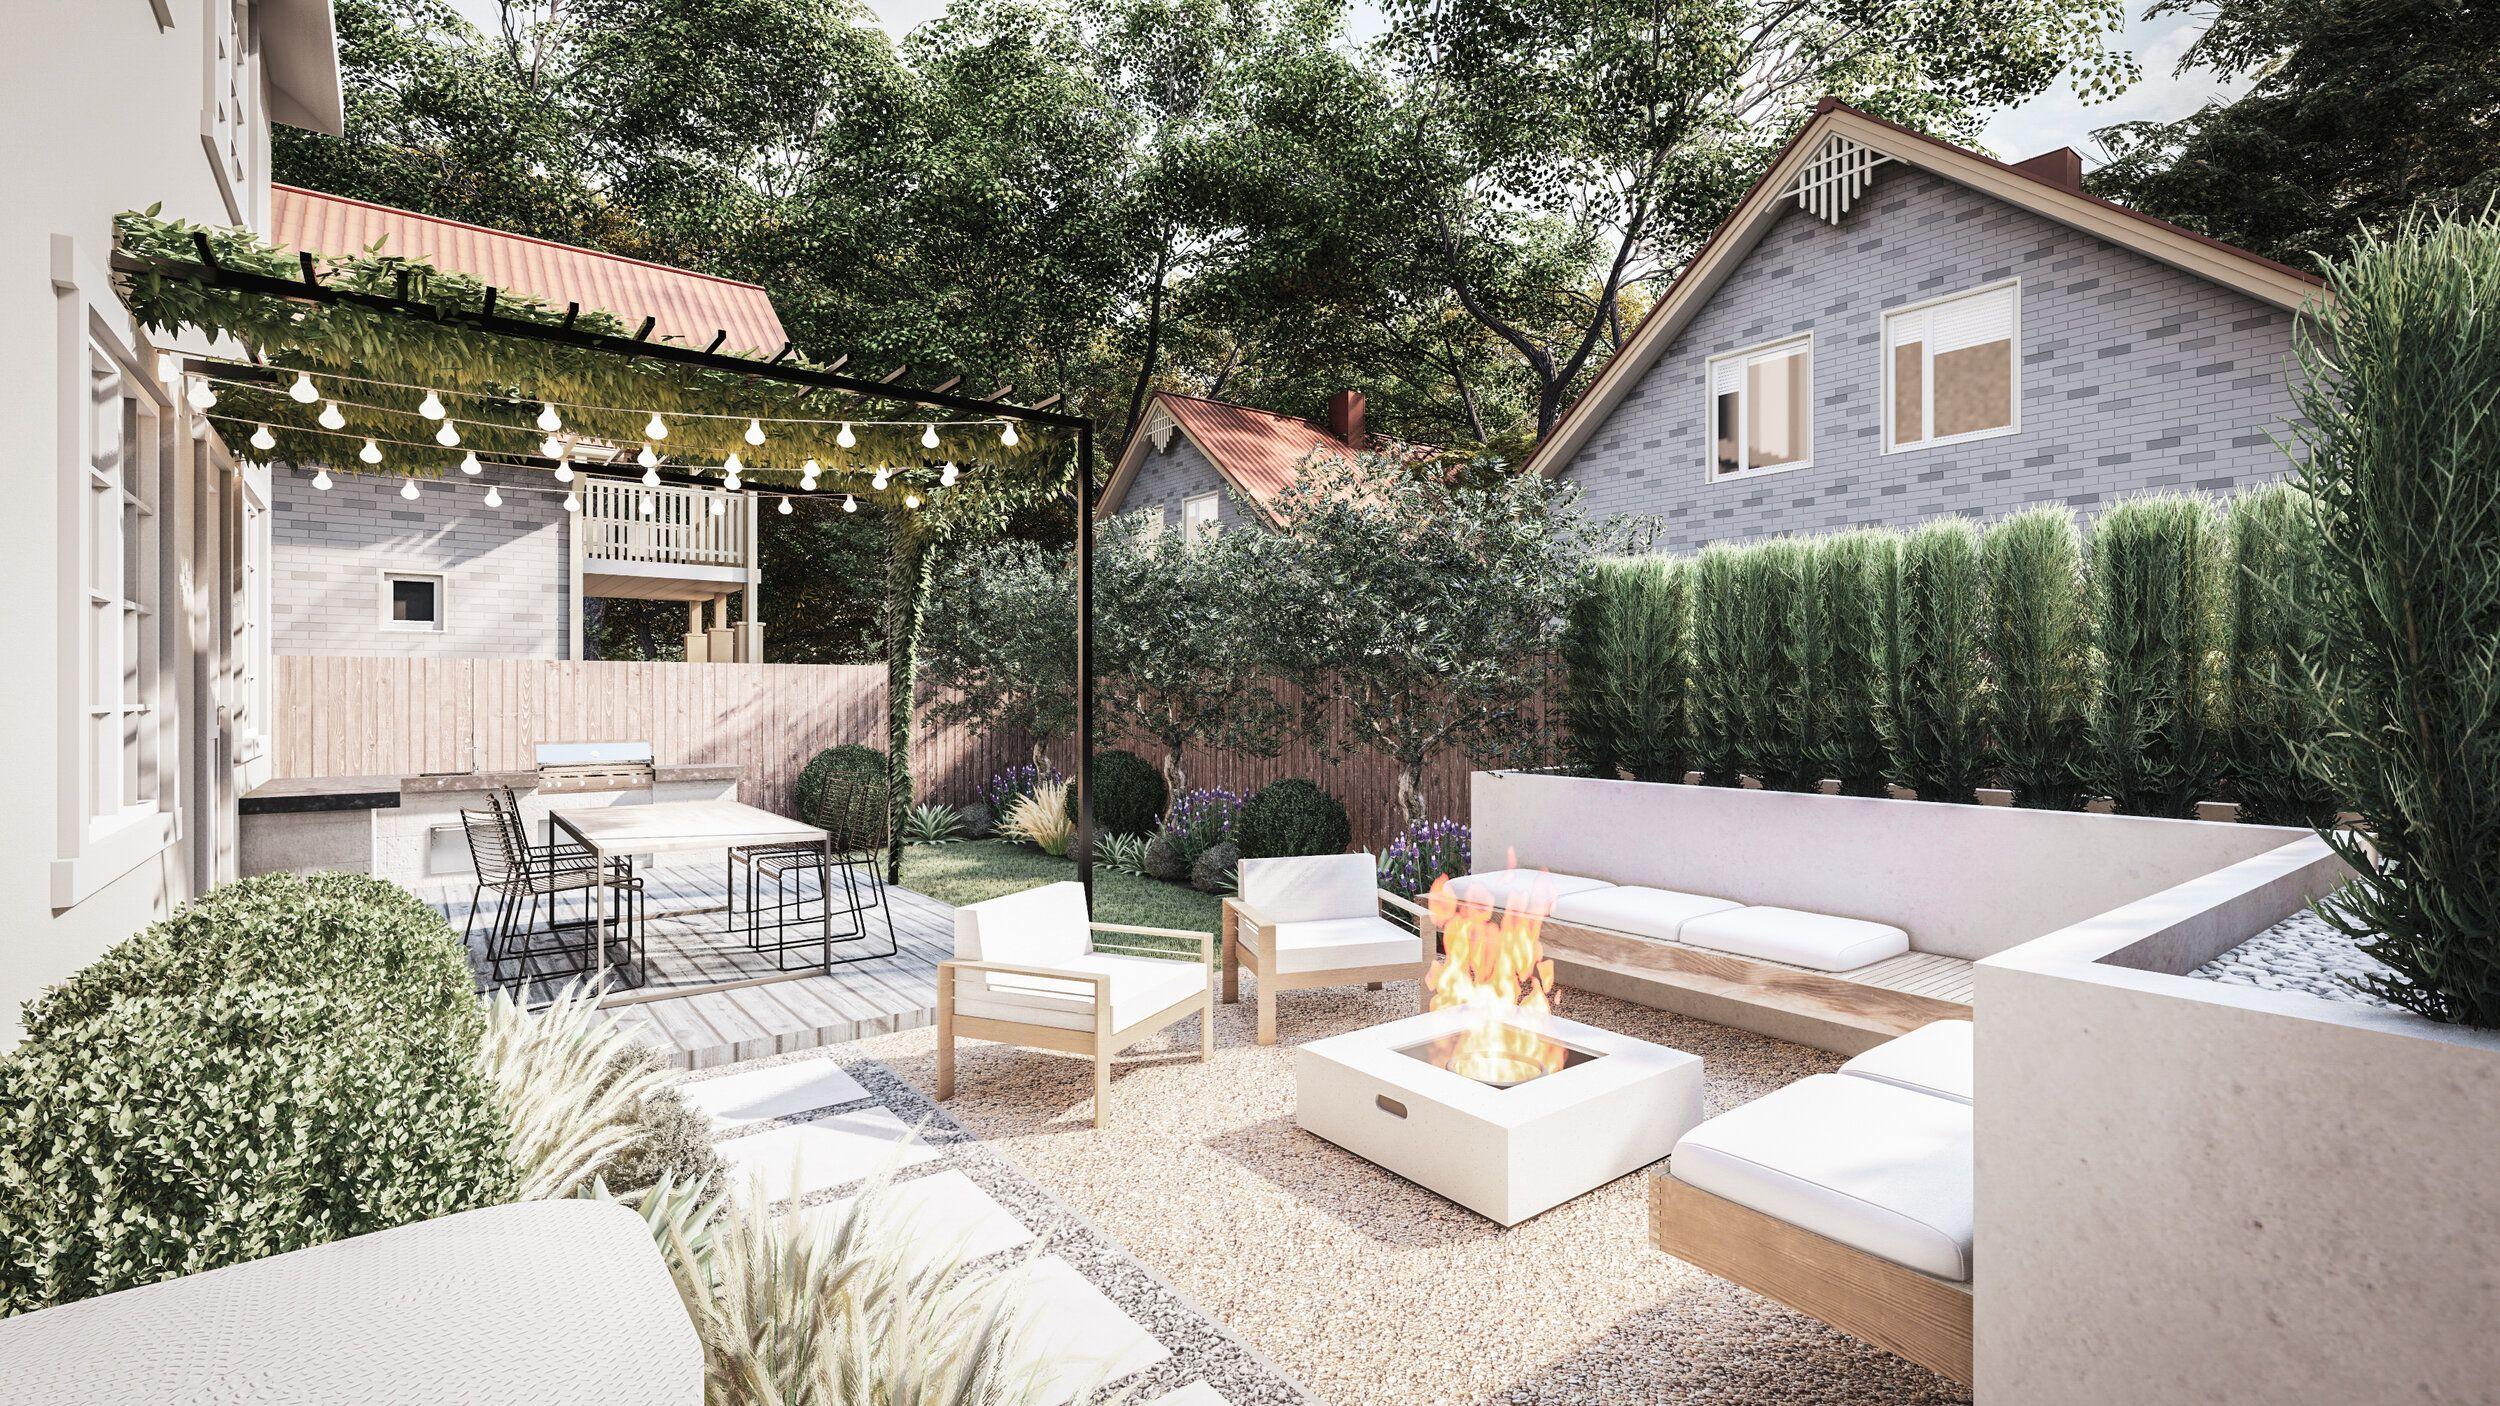 Examples Of Yardzen Designs Yardzen Online Landscape Design In 2020 Online Landscape Design Backyard Landscape Design